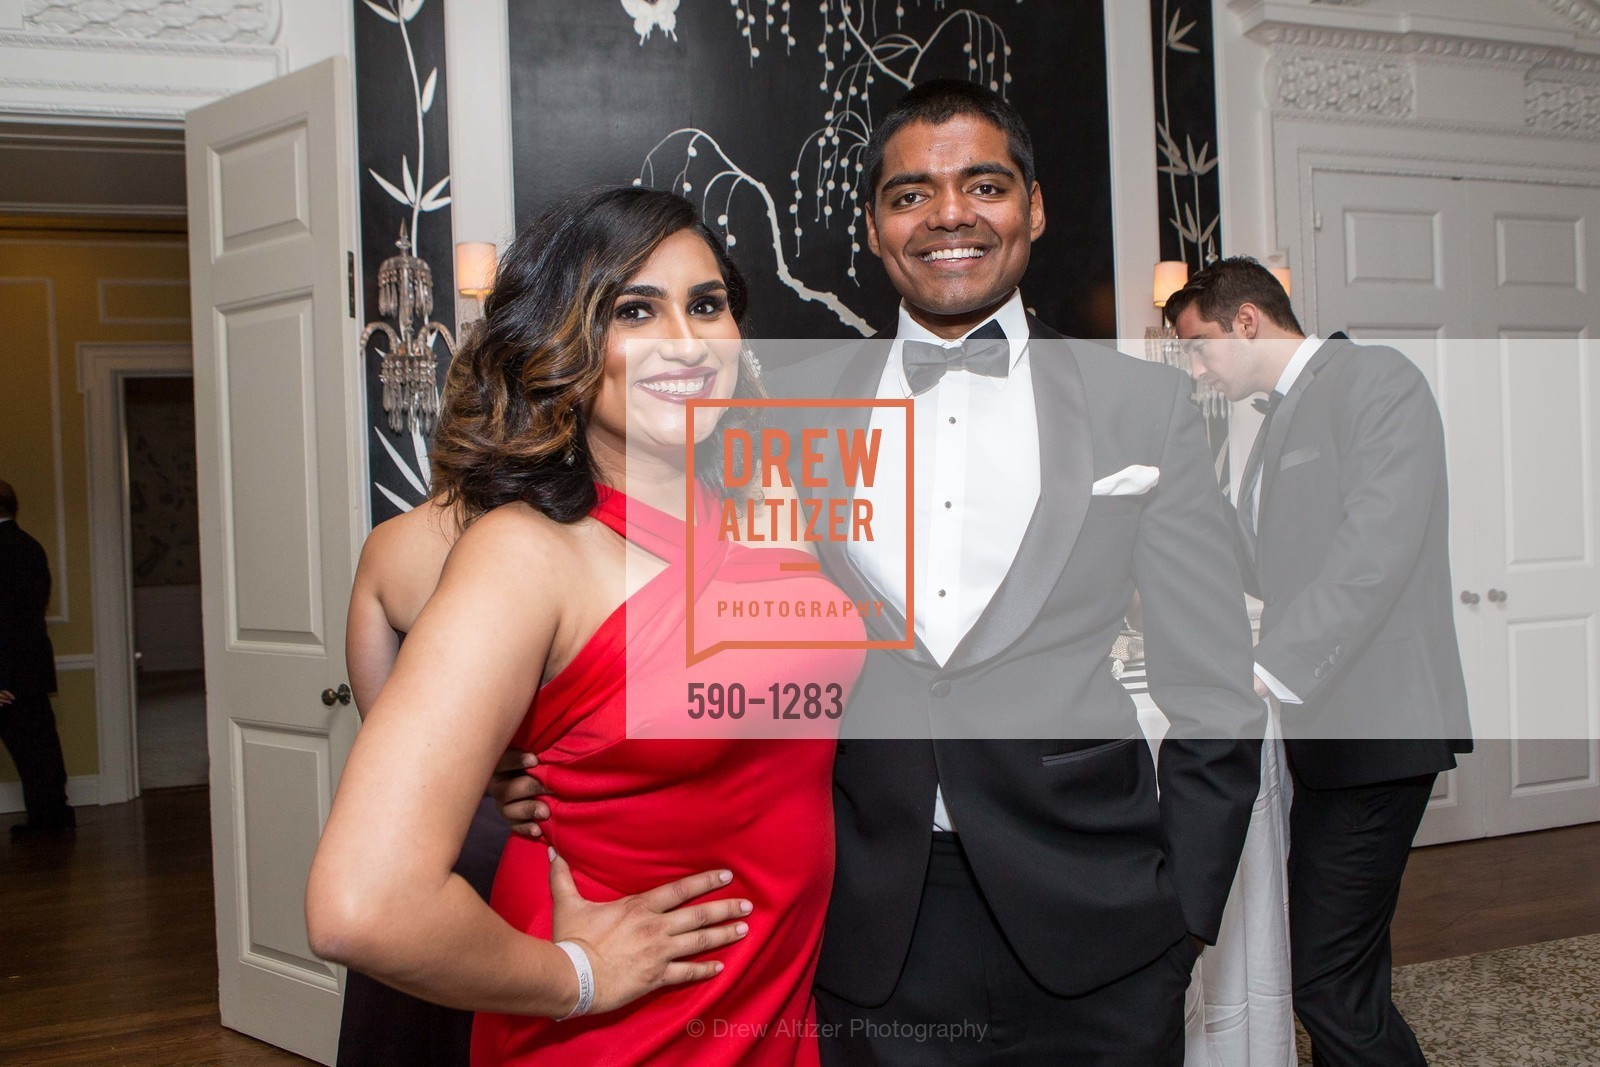 Teesta Kaur, Sri Majji, Spinsters of San Francisco Annual Ball 2016, US, June 25th, 2016